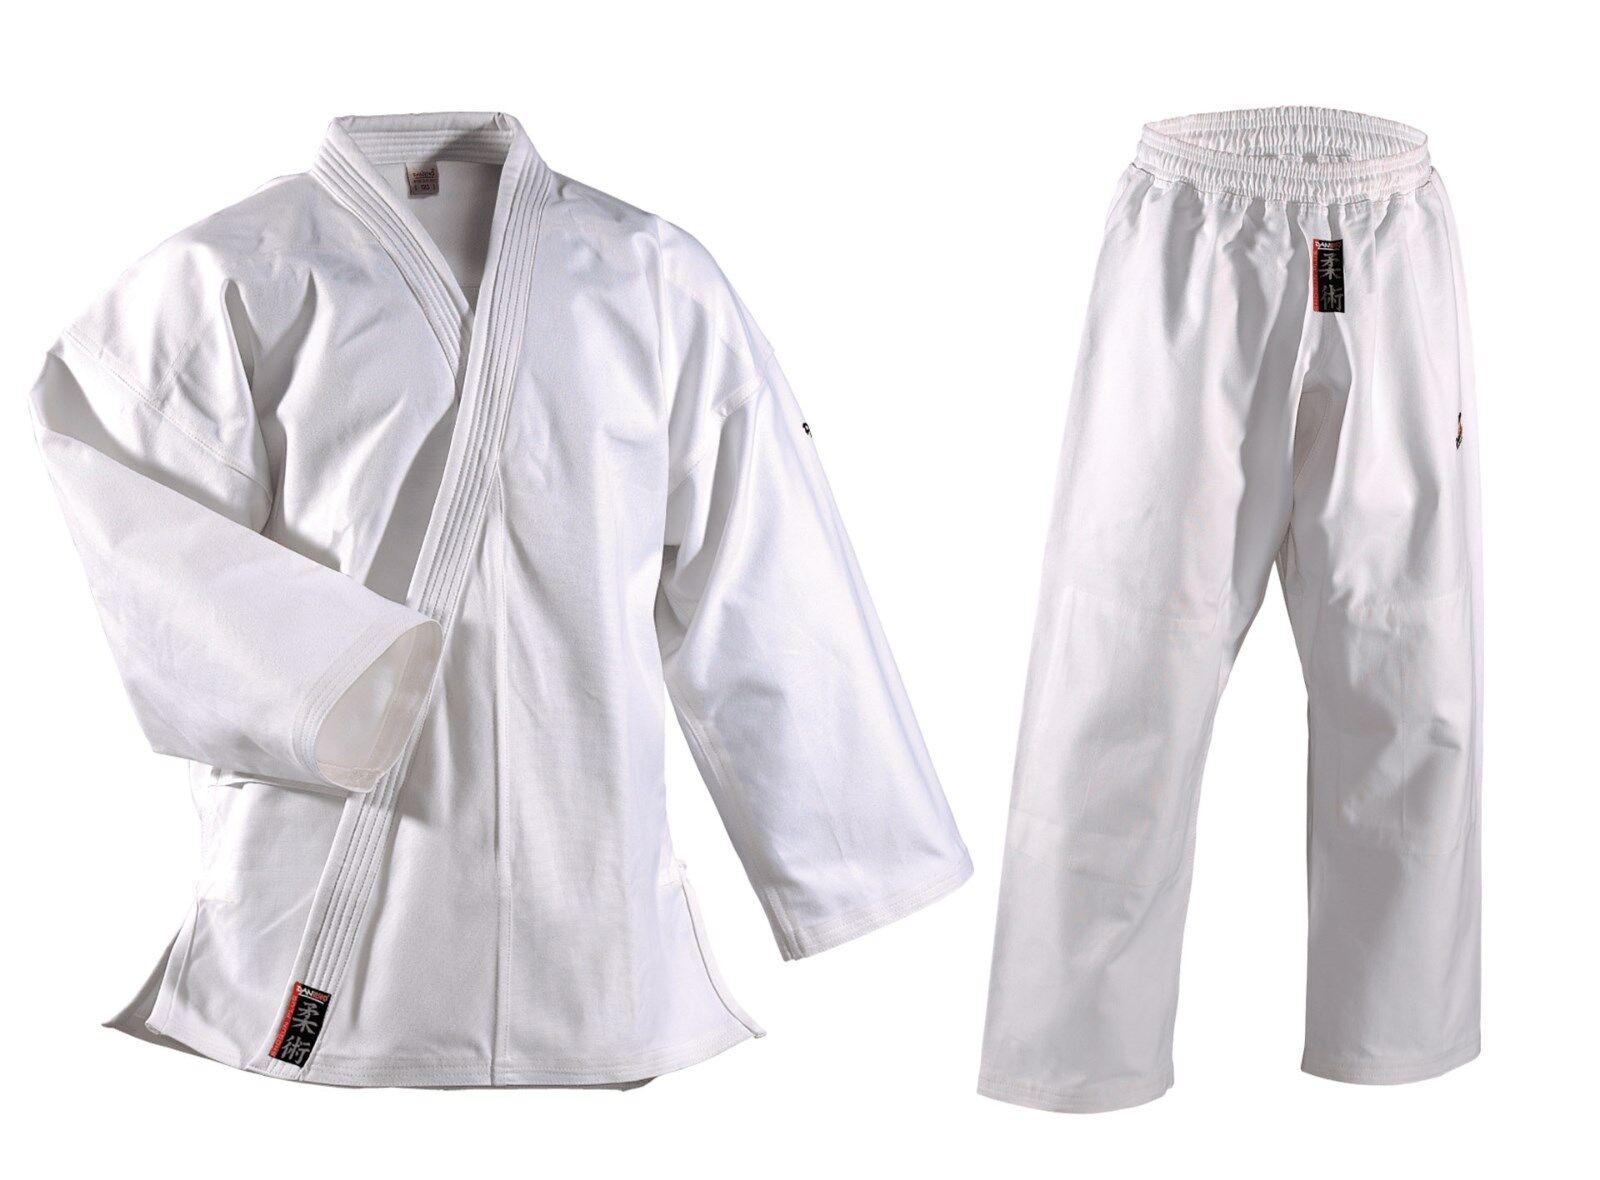 Ju Jutsu Allround Anzug Shogun Plus, DAN RHO. Extra Extra Extra schwer 14Oz. SV, Judo, MMA fffee4